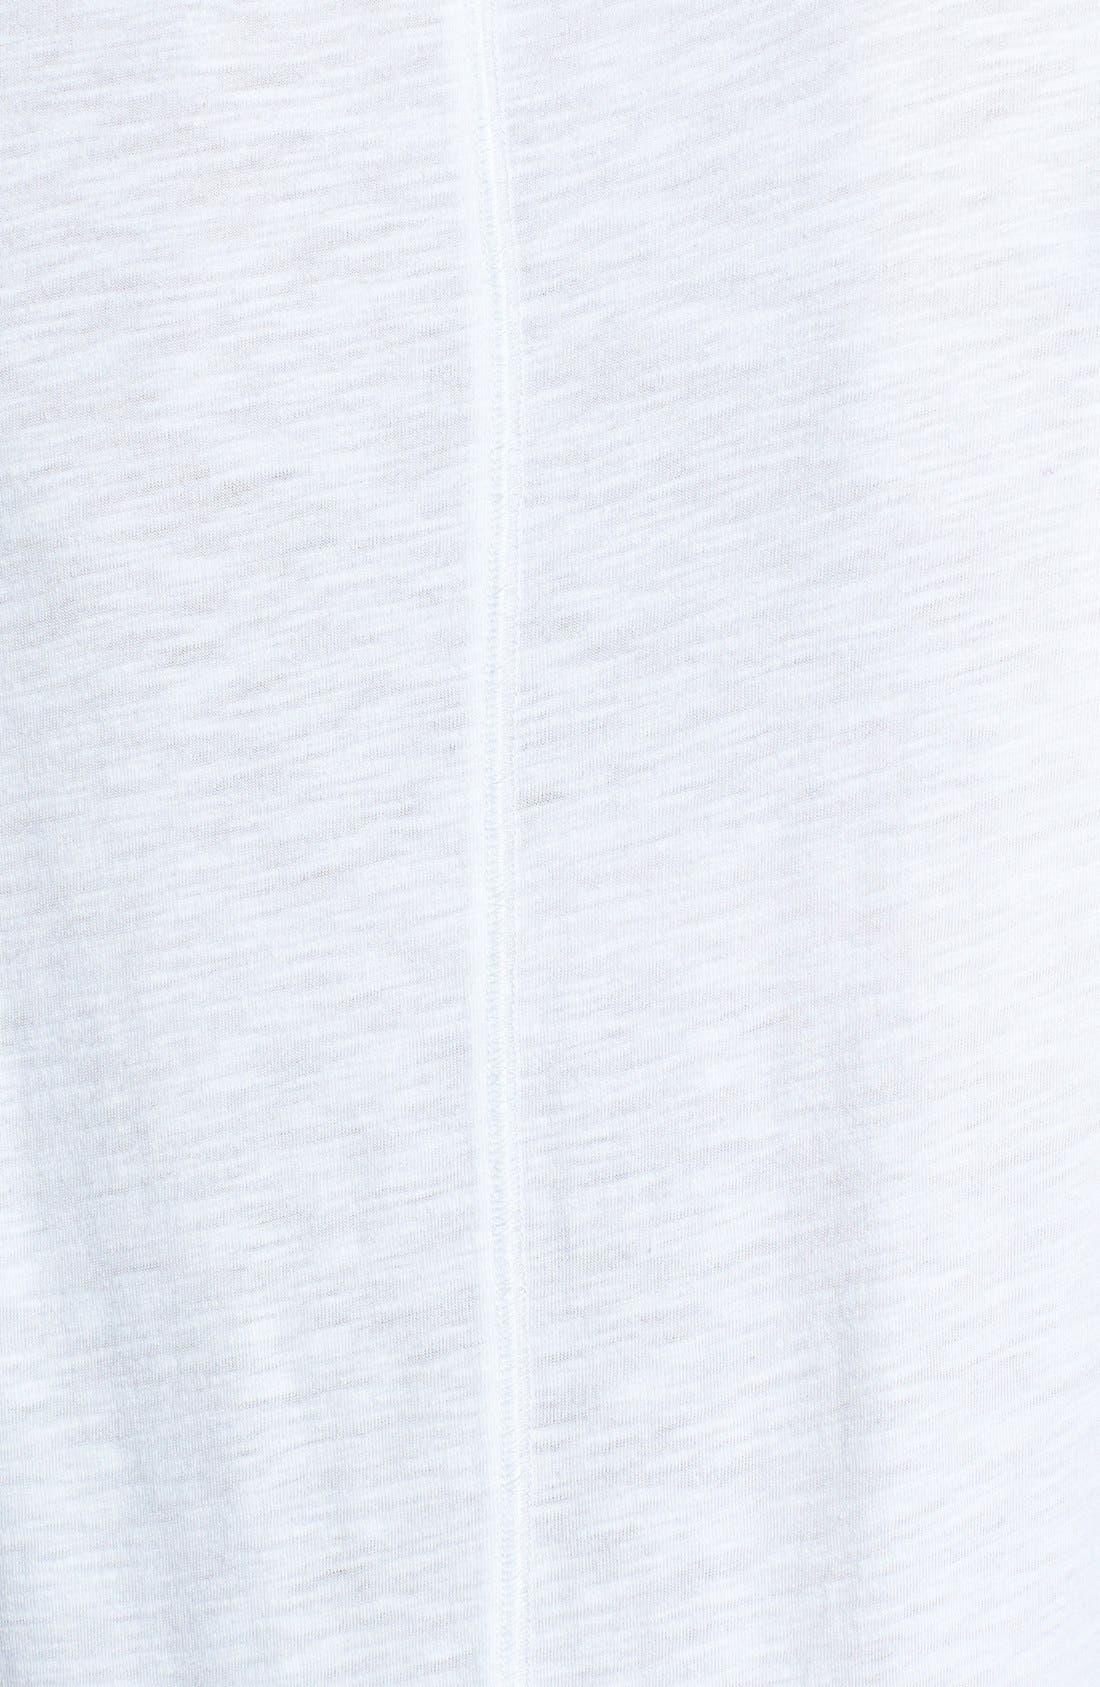 Short Sleeve Cotton & Modal Tee,                             Alternate thumbnail 40, color,